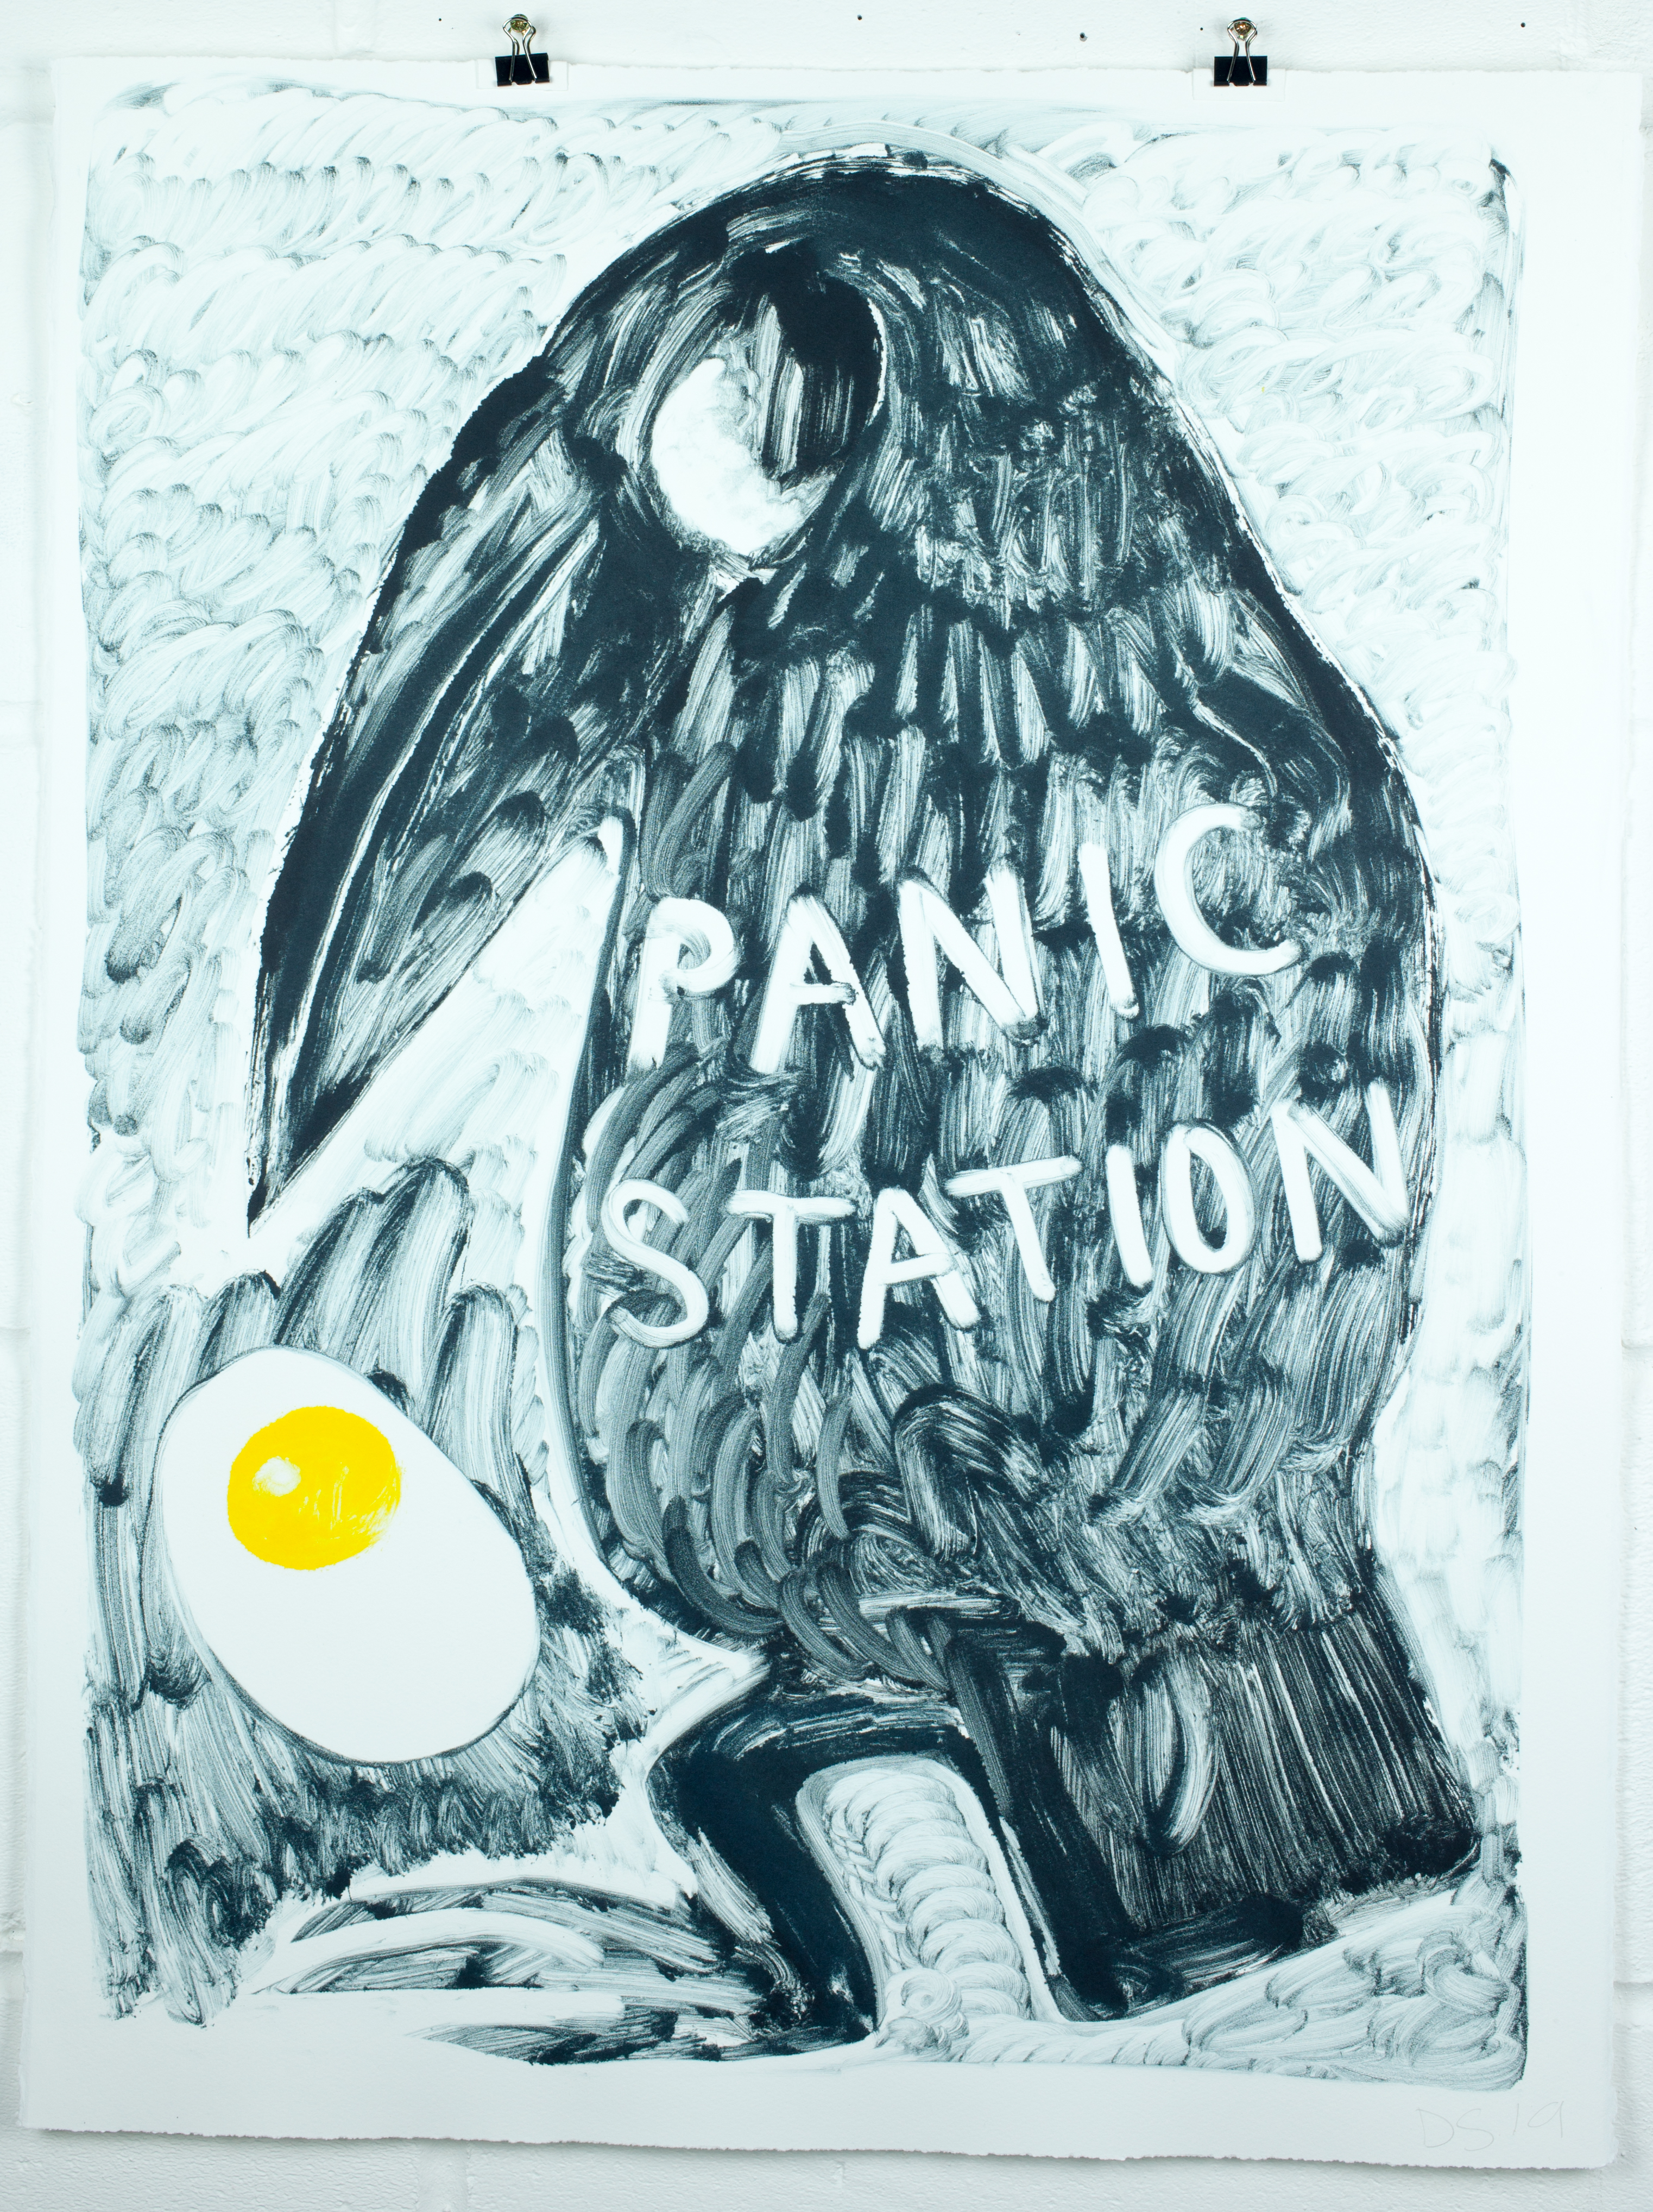 David Surman. Panic Station